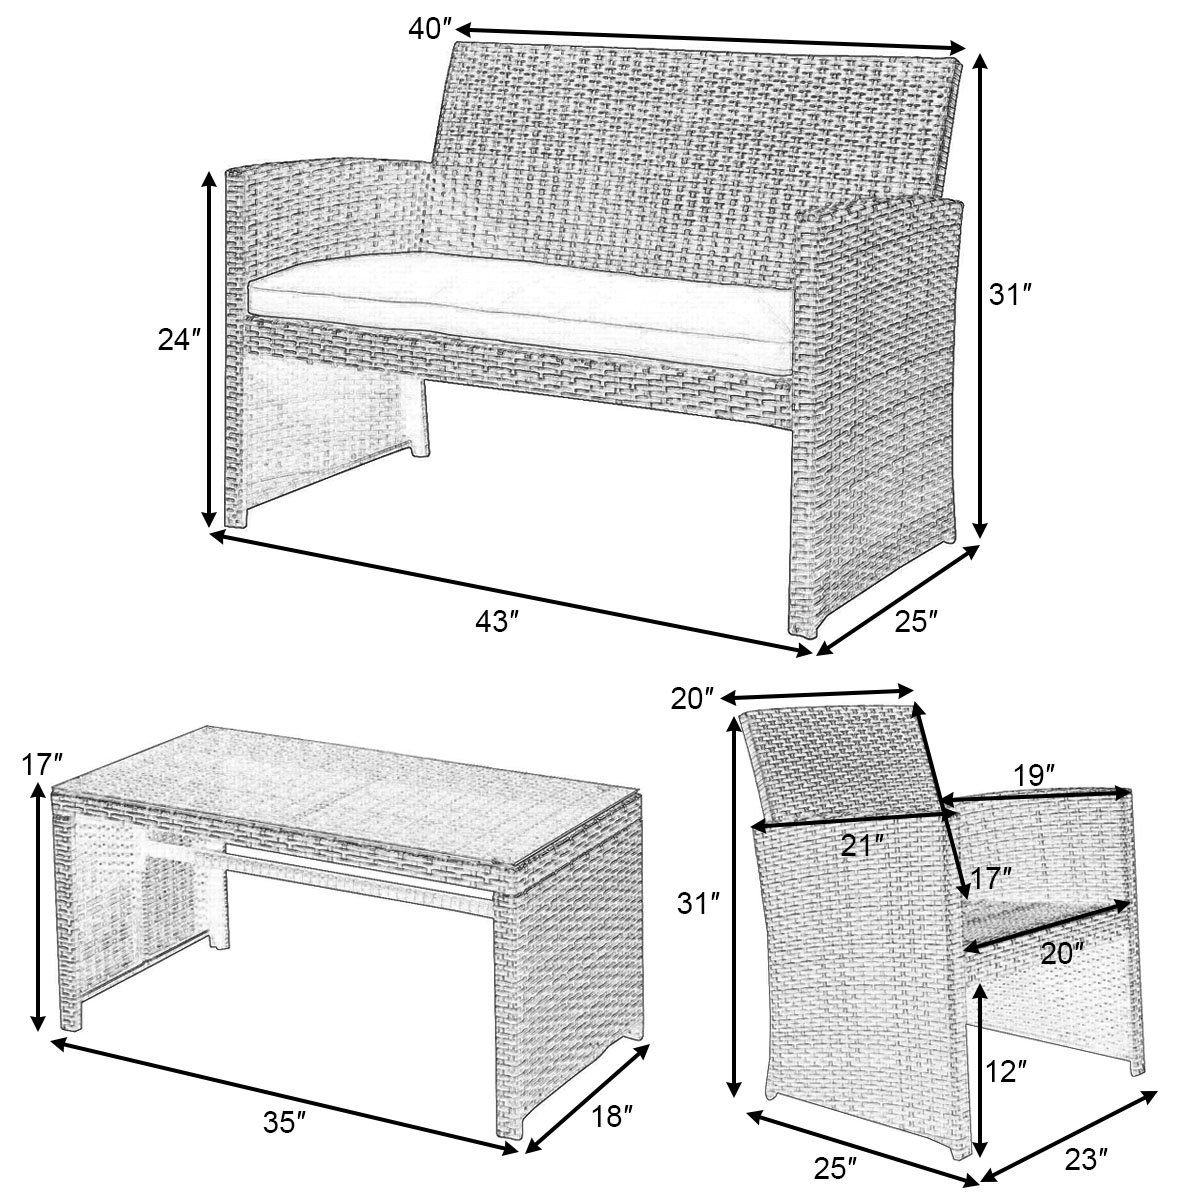 Goplus 4 PC Rattan Patio Furniture Set Garden Lawn Sofa Cushioned Seat Wicker Sofa (Mix Gray) by Goplus (Image #7)